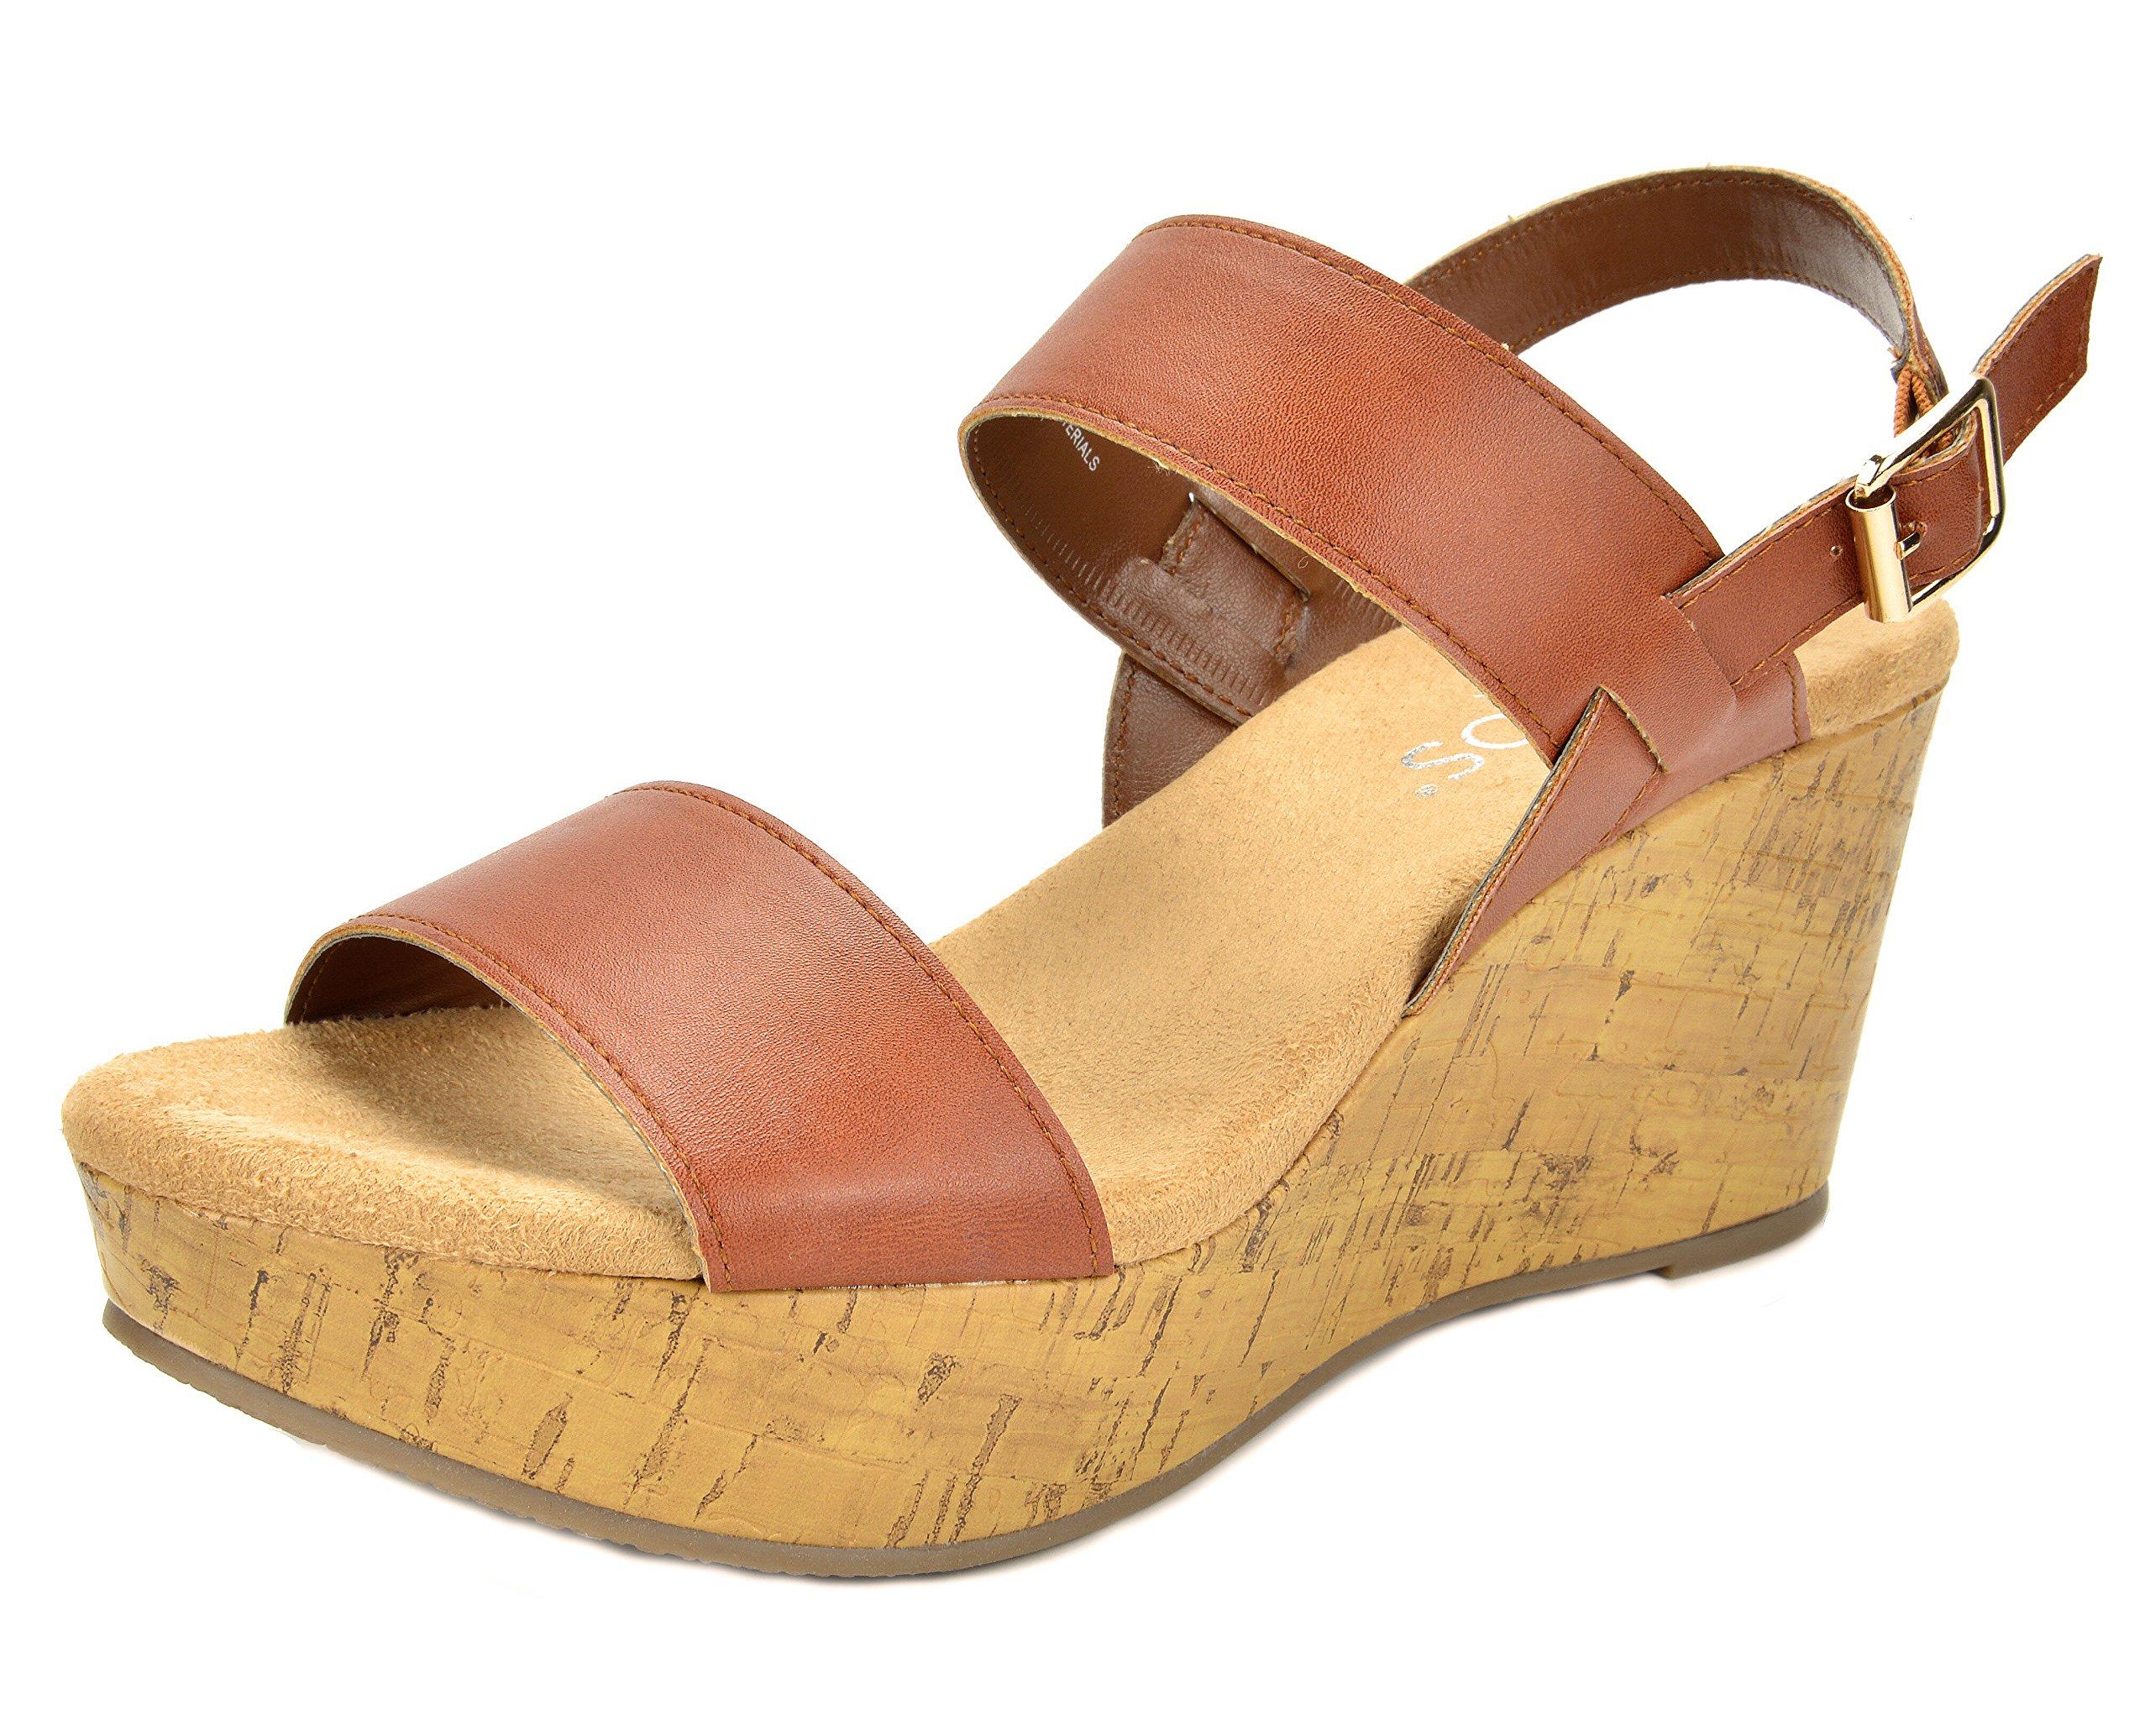 6e82d03a7b Galleon - TOETOS Women's Sandro-01 Tan Mid Heel Platform Wedges Sandals -  10 M US